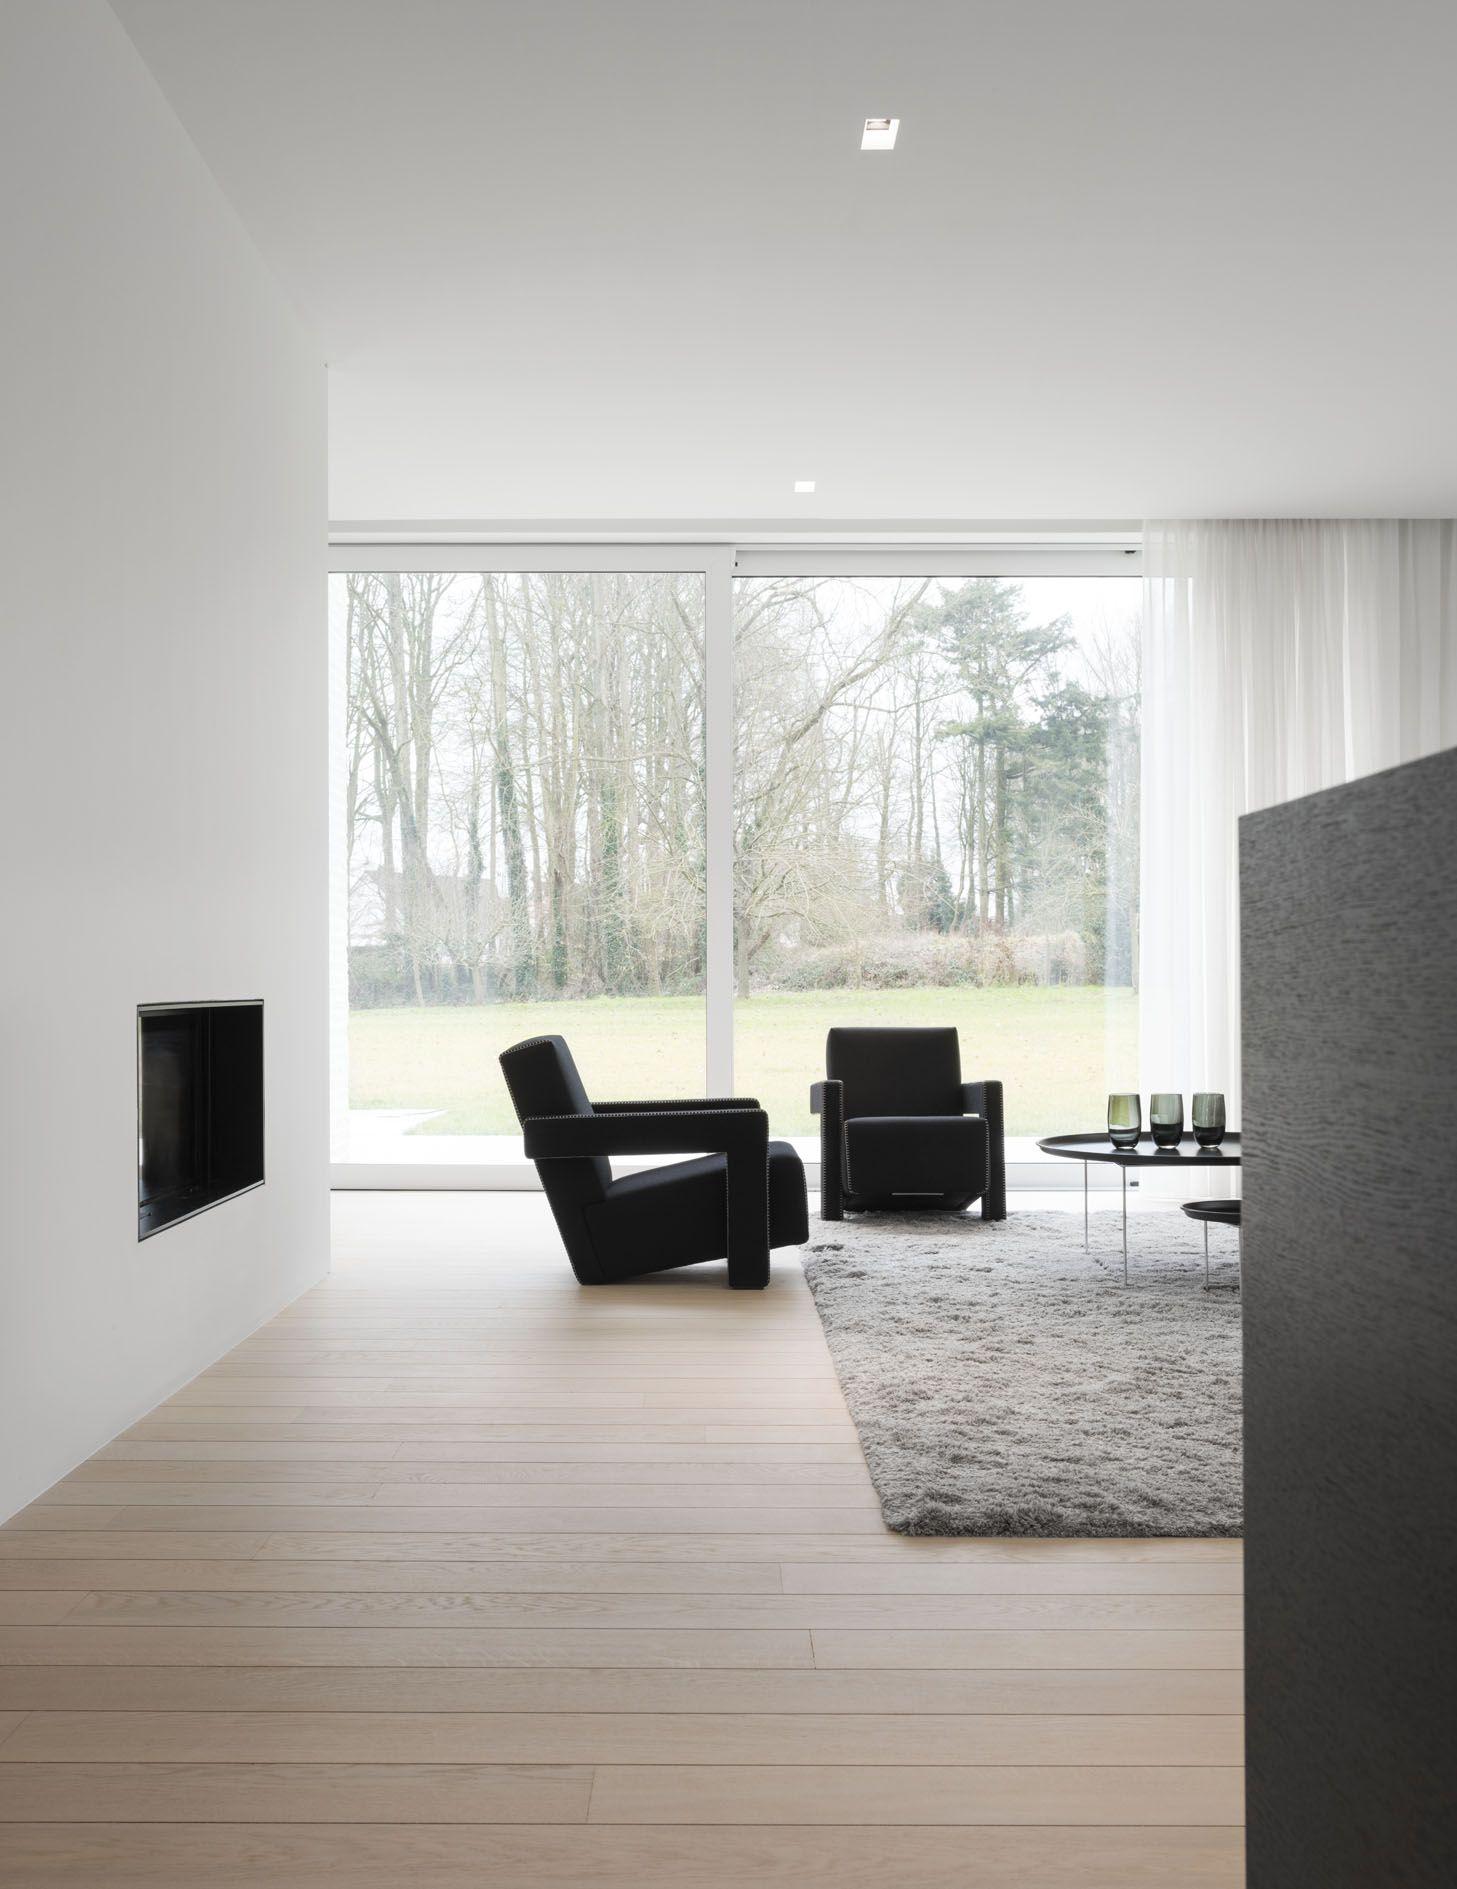 Big Windows Wall Accompanying Minimal Living Room Decor Huis Interieur Interieur Woonkamer Interieur